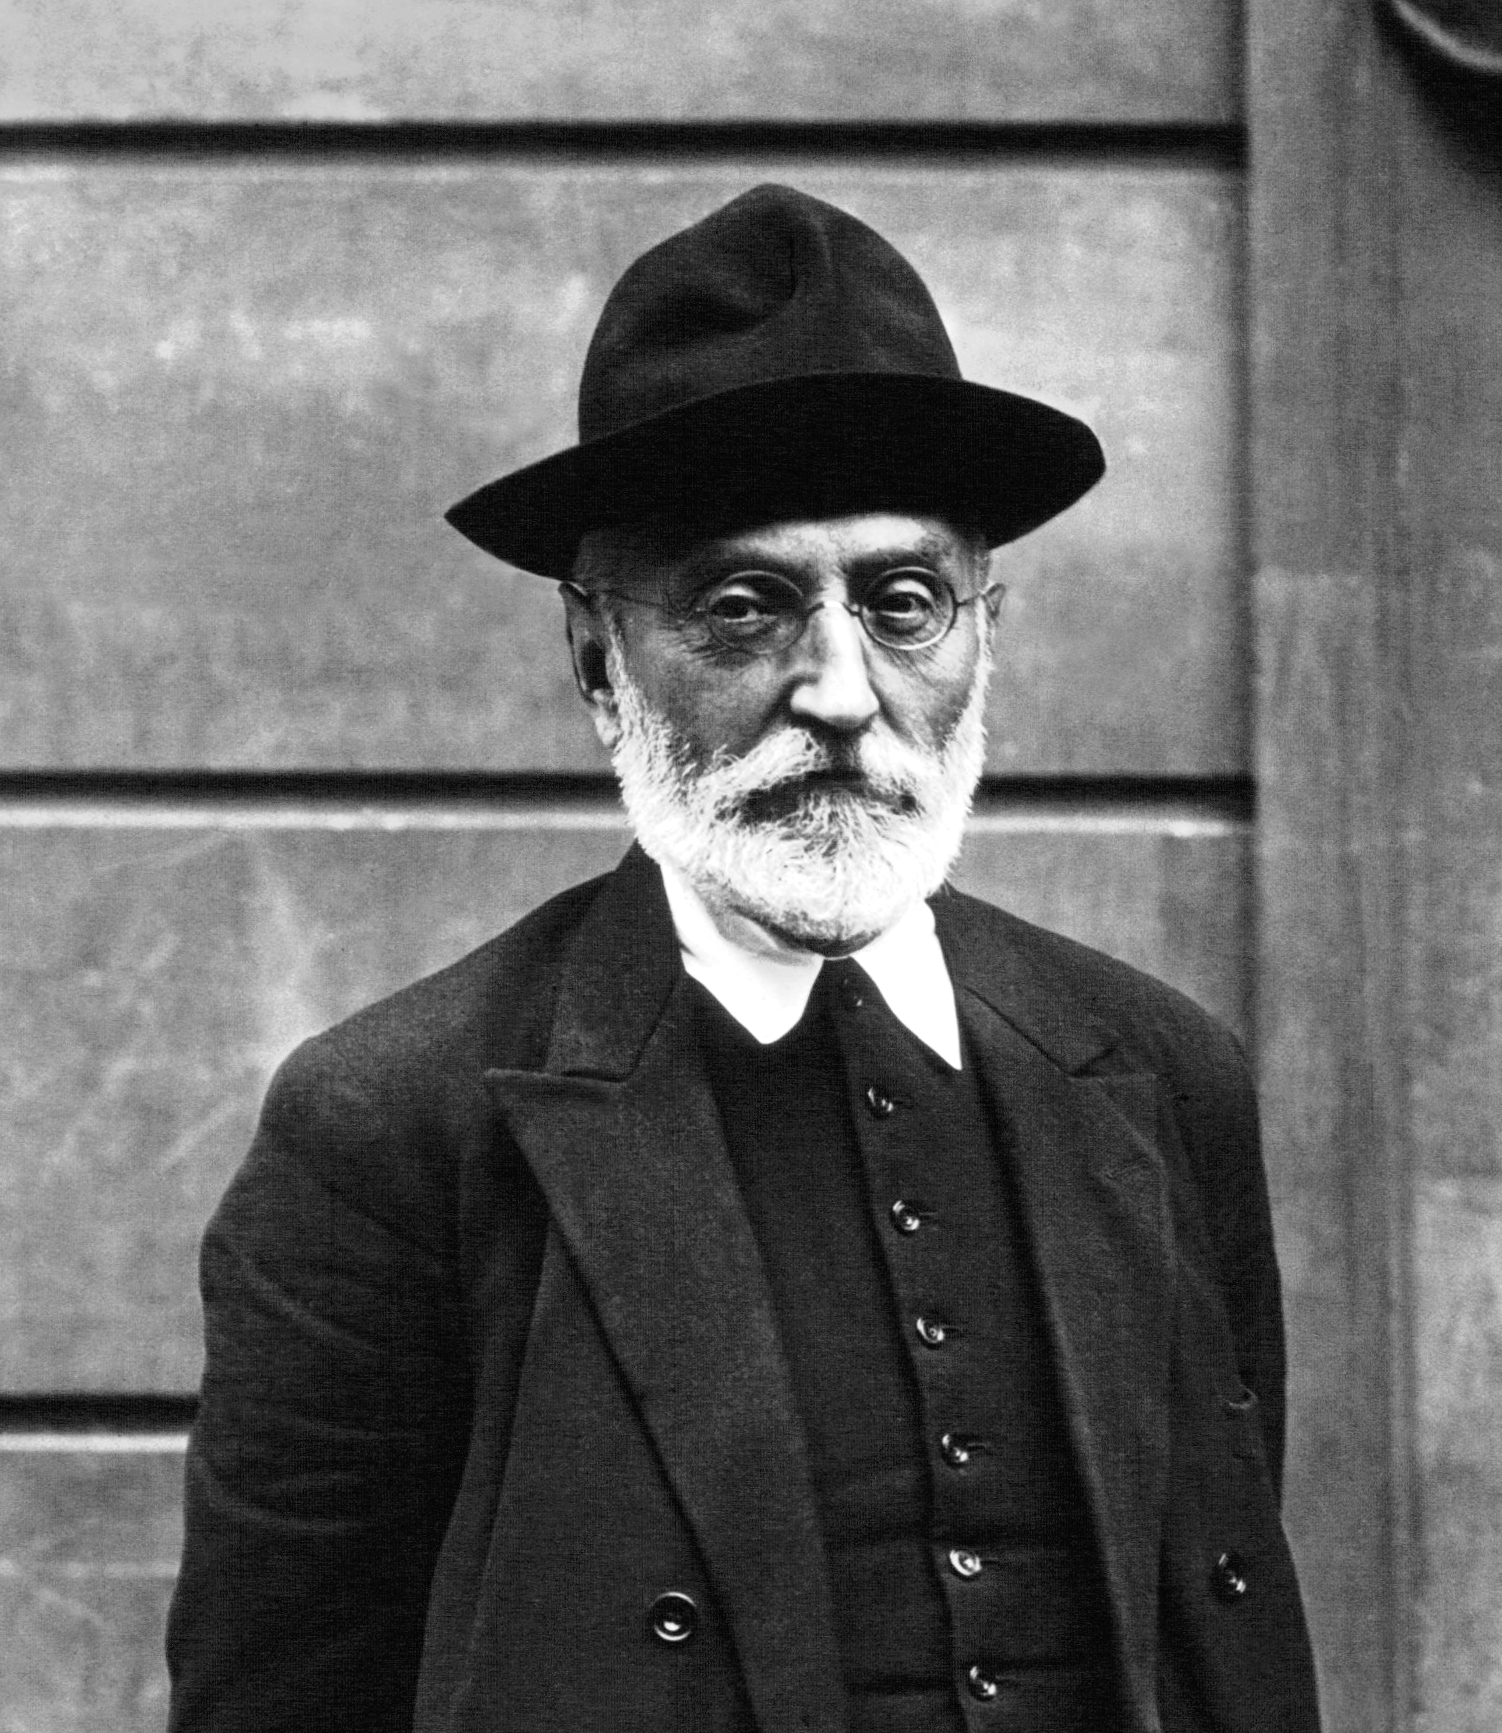 Miguel_de_Unamuno_Meurisse_1925.jpg